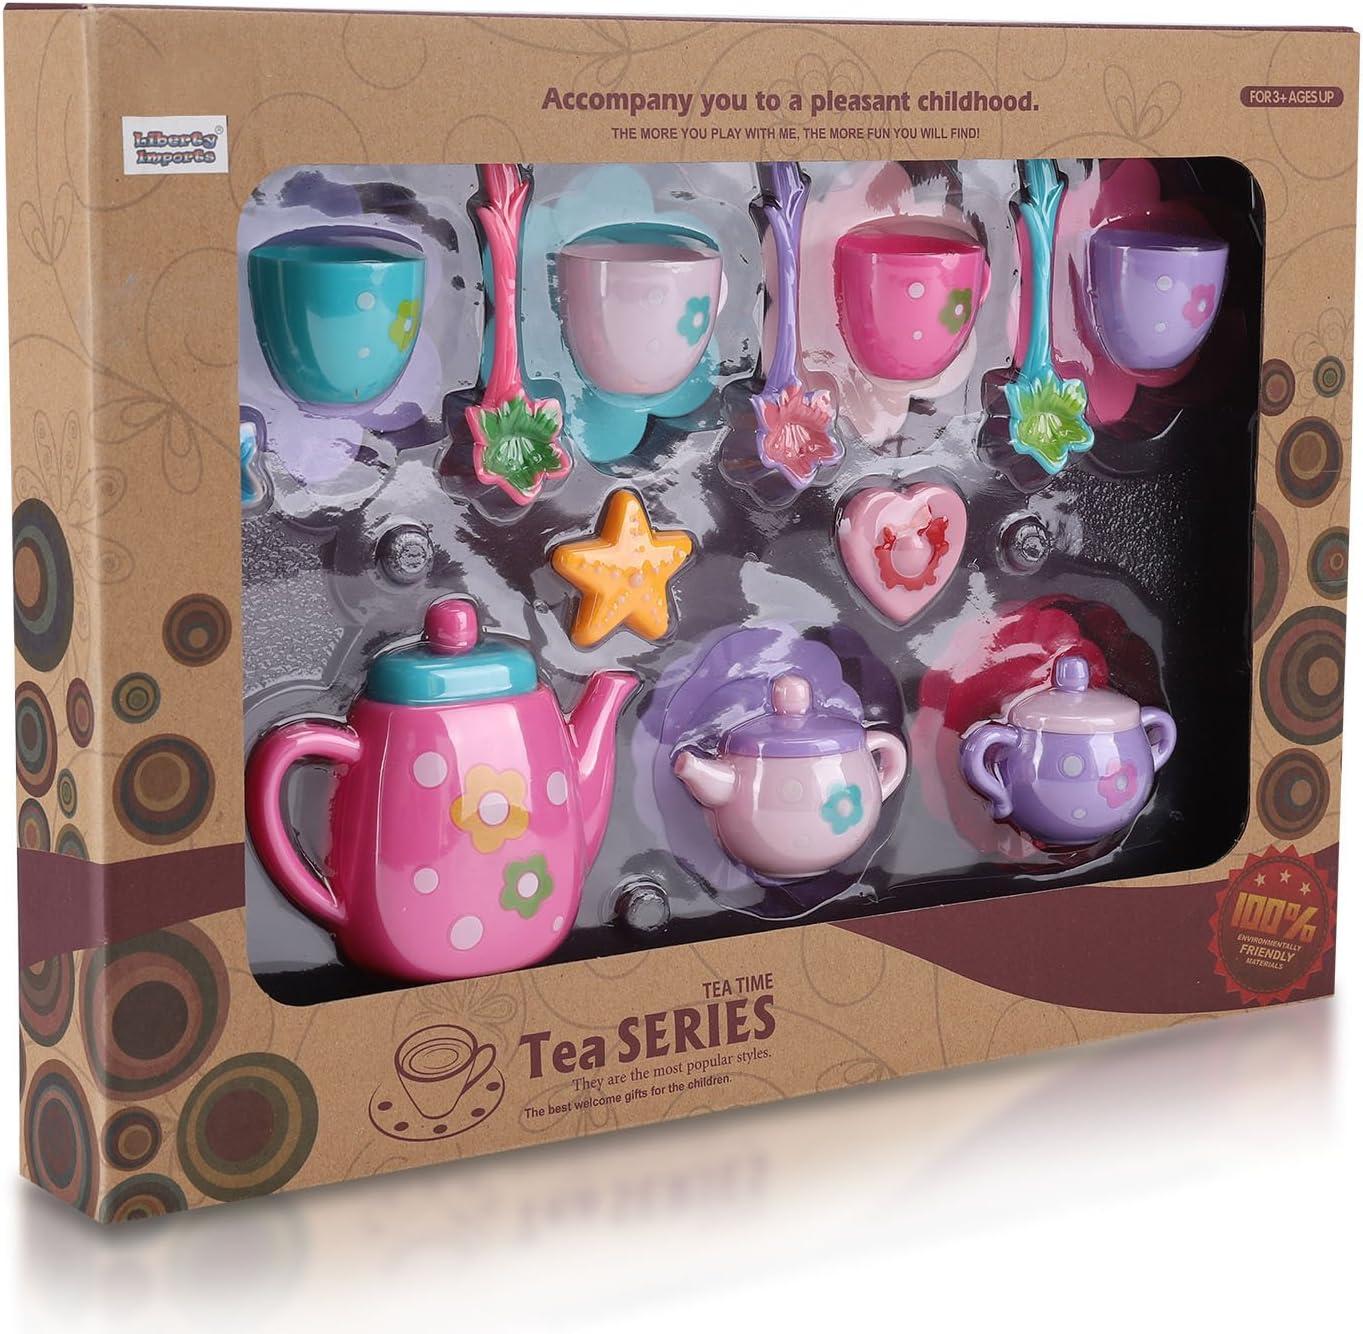 Disney Princess n Me Royal Tea Time Tea set Pretend Play Kitchen Toy Gift